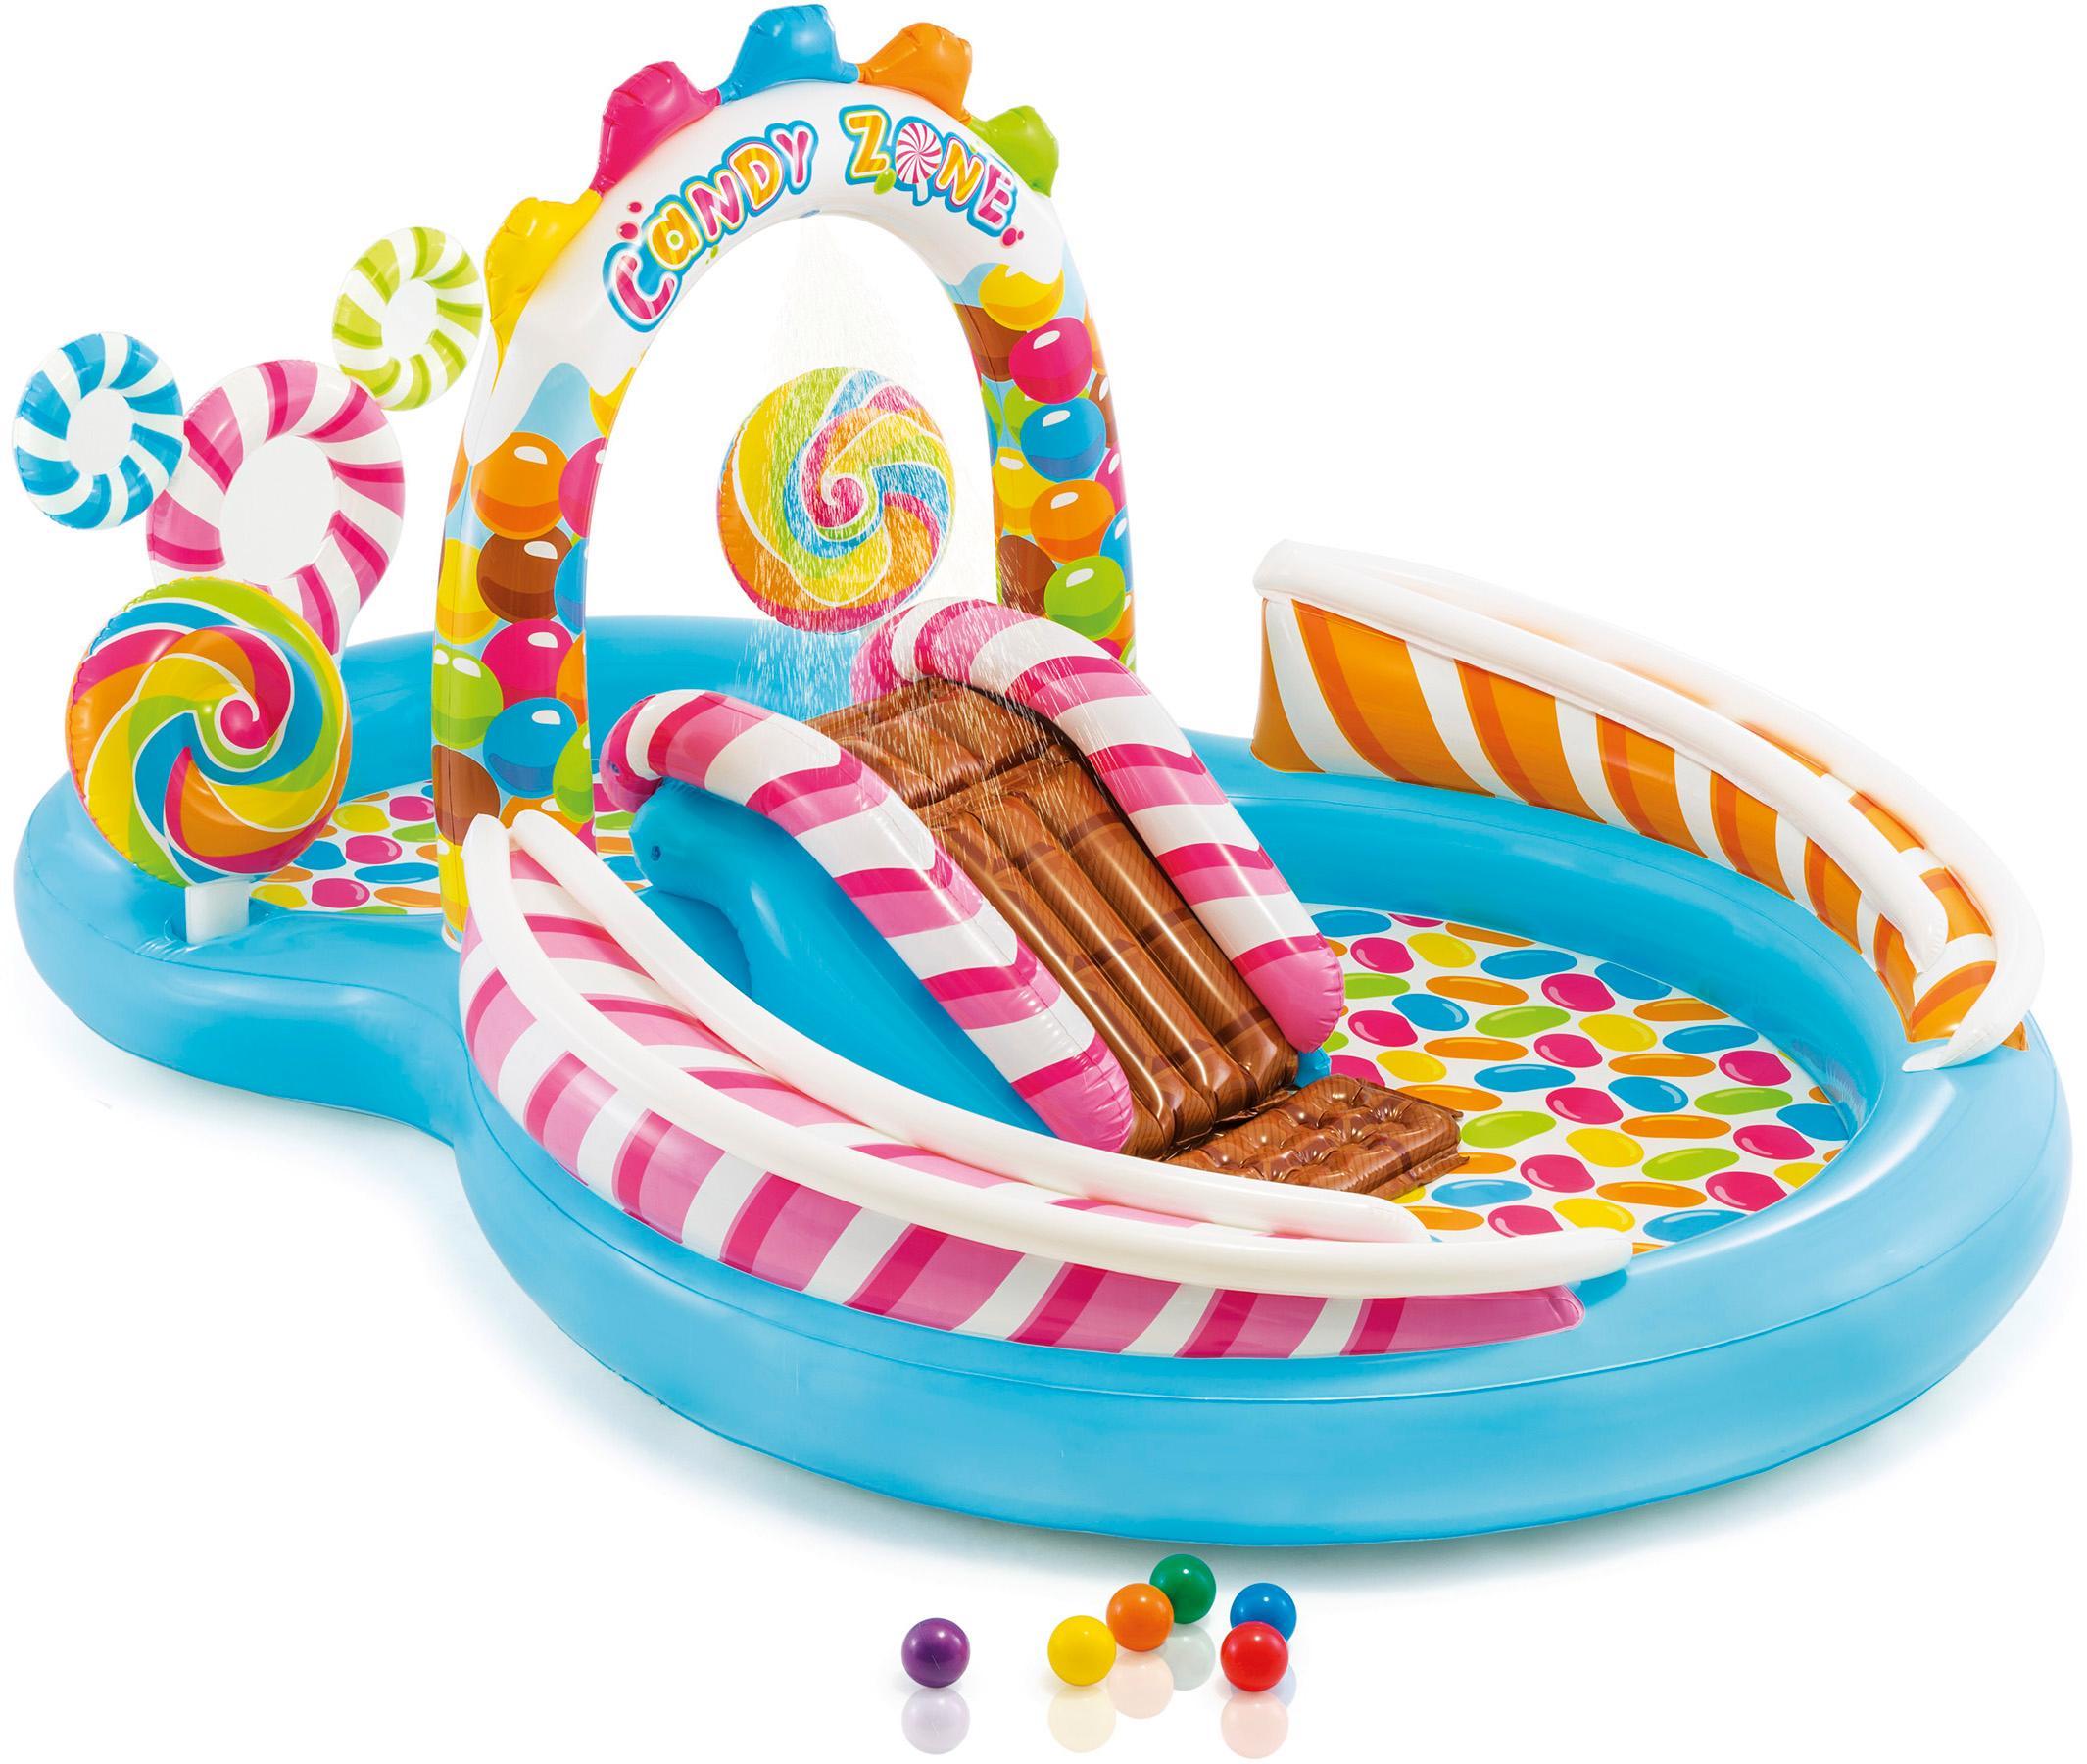 "Intex Planschbecken ""Candy Zone™ Play Center"" Technik & Freizeit/Heimwerken & Garten/Garten & Balkon/Pools & Planschbecken/Planschbecken/Kinderplanschbecken"